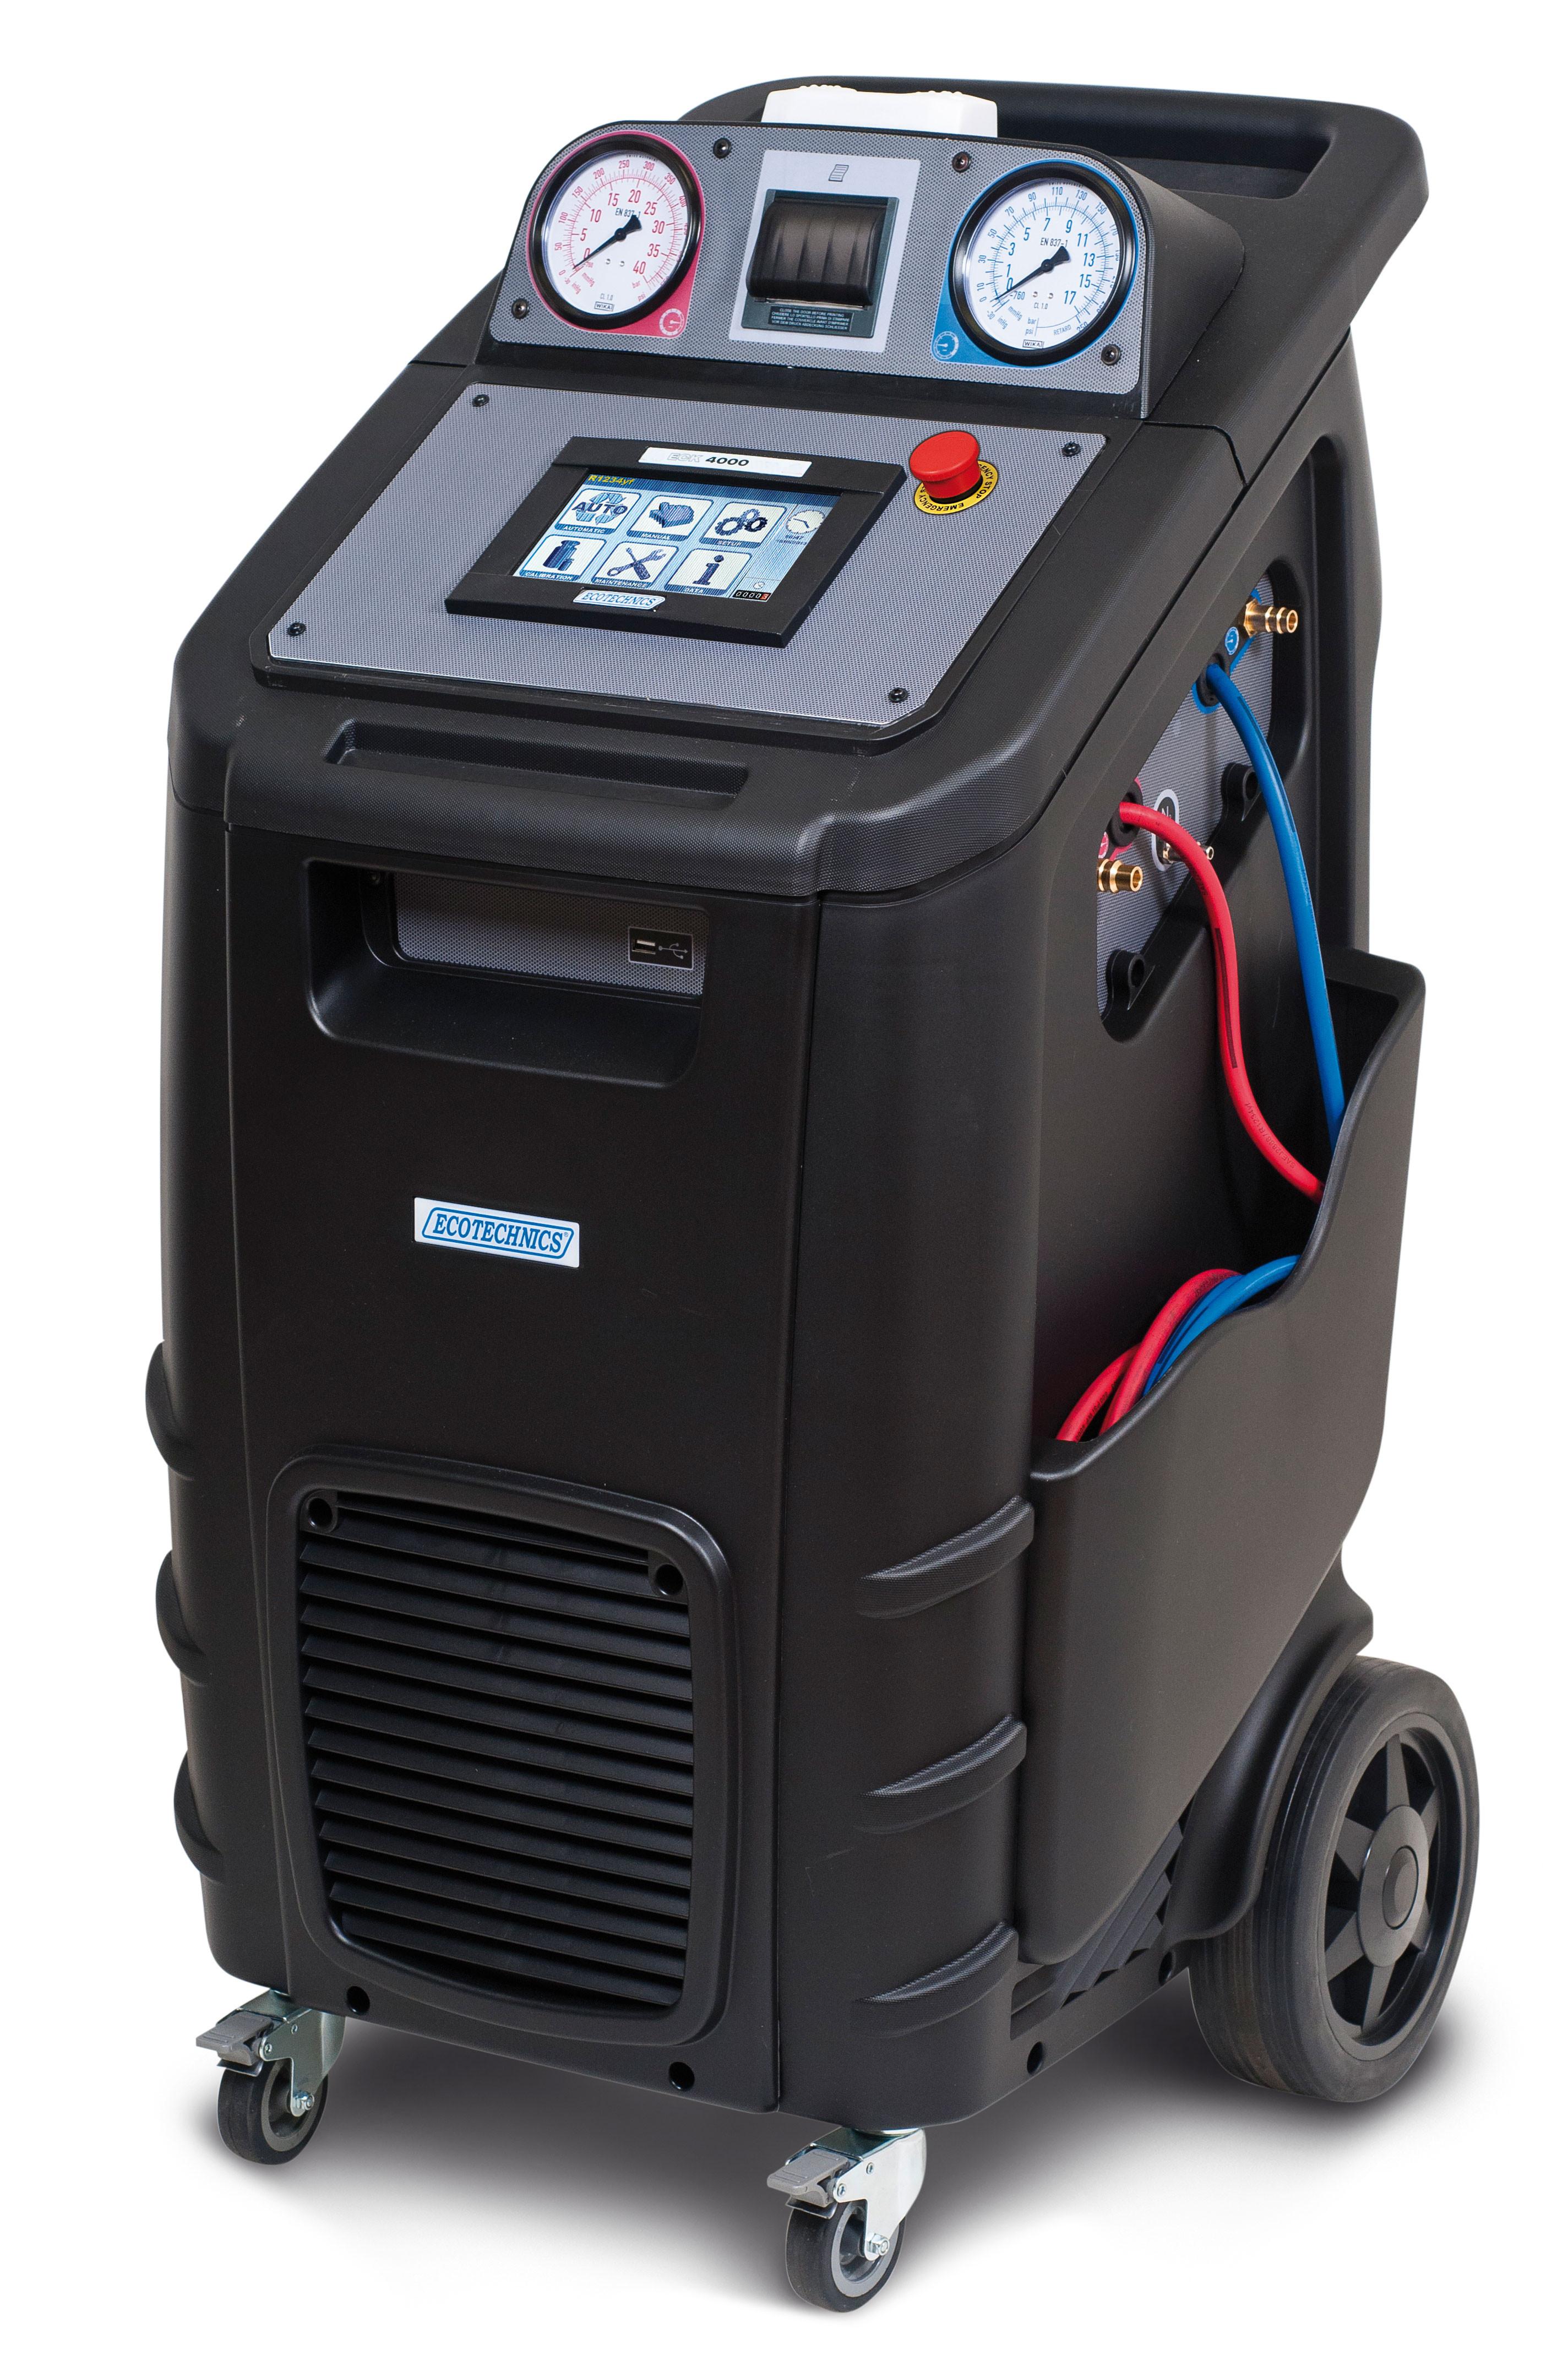 Eck 4000 – Ecotechnics